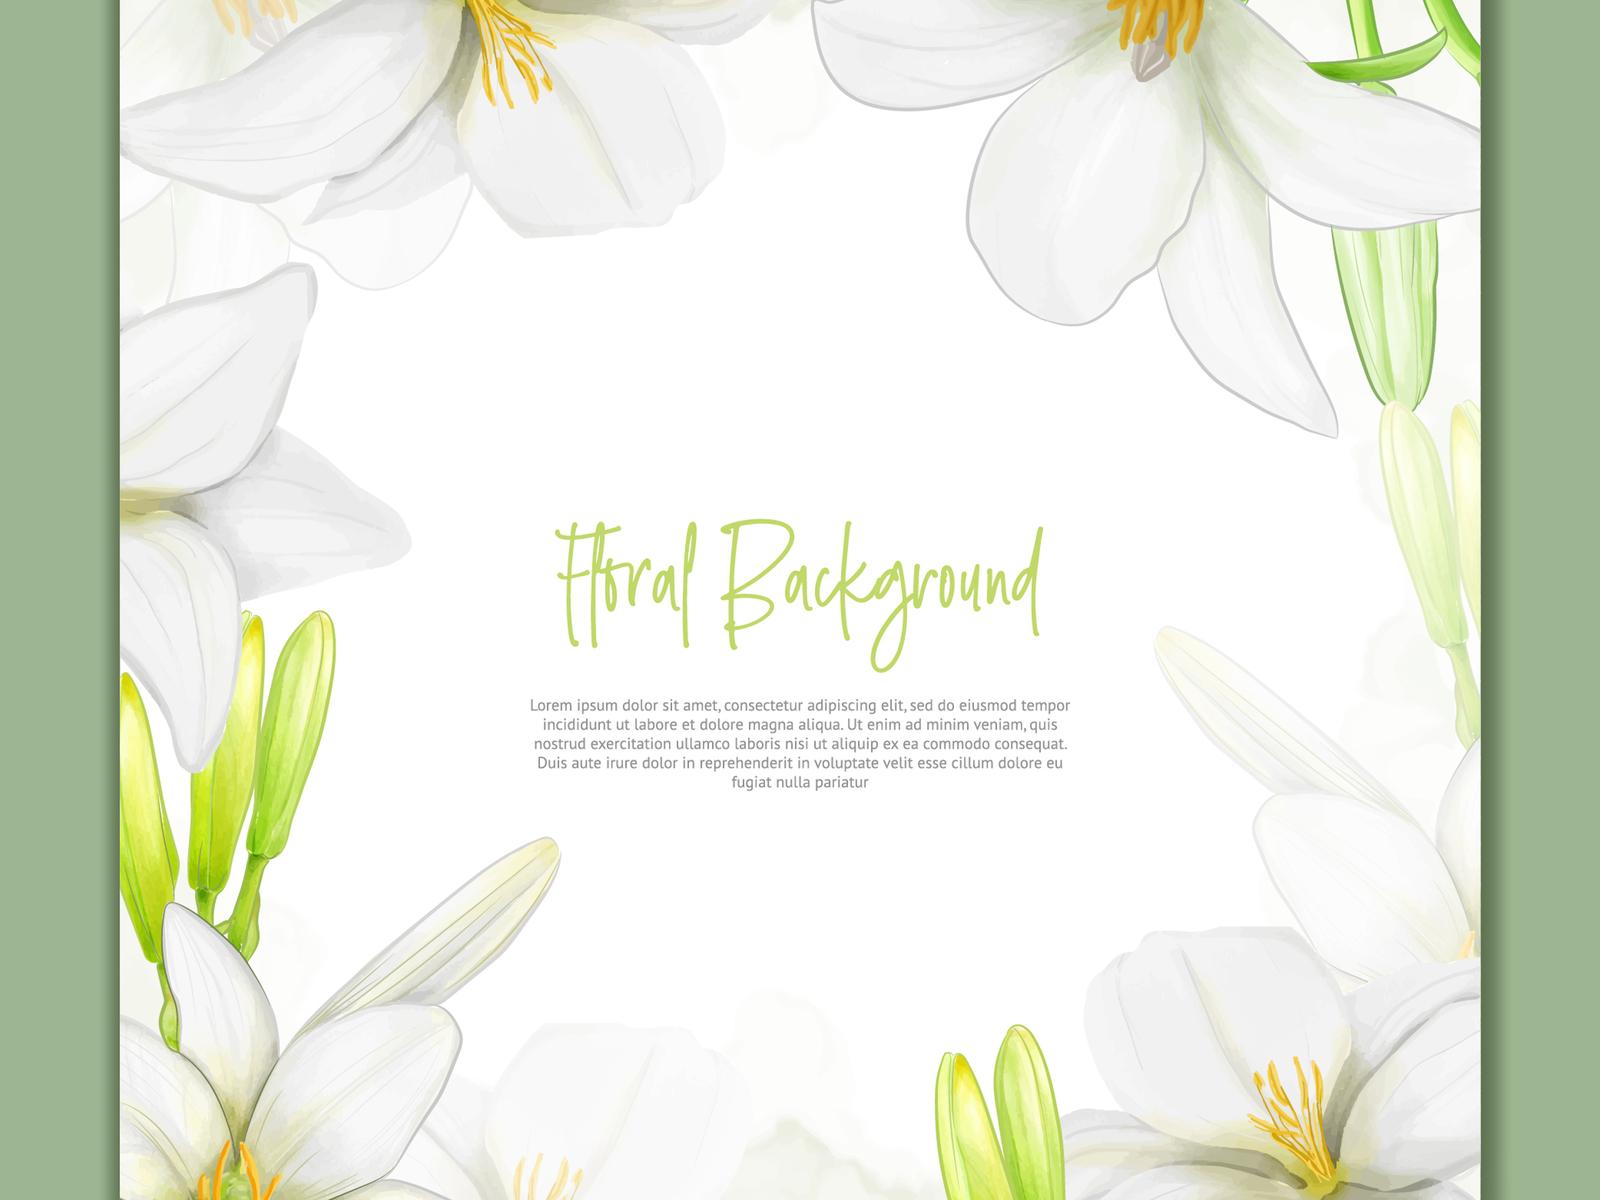 Beautiful lily flowers background in watercolor style by volcebyyou httpsfreepikpremium vectorbeautiful lily flowers background in watercolor style3028910m izmirmasajfo